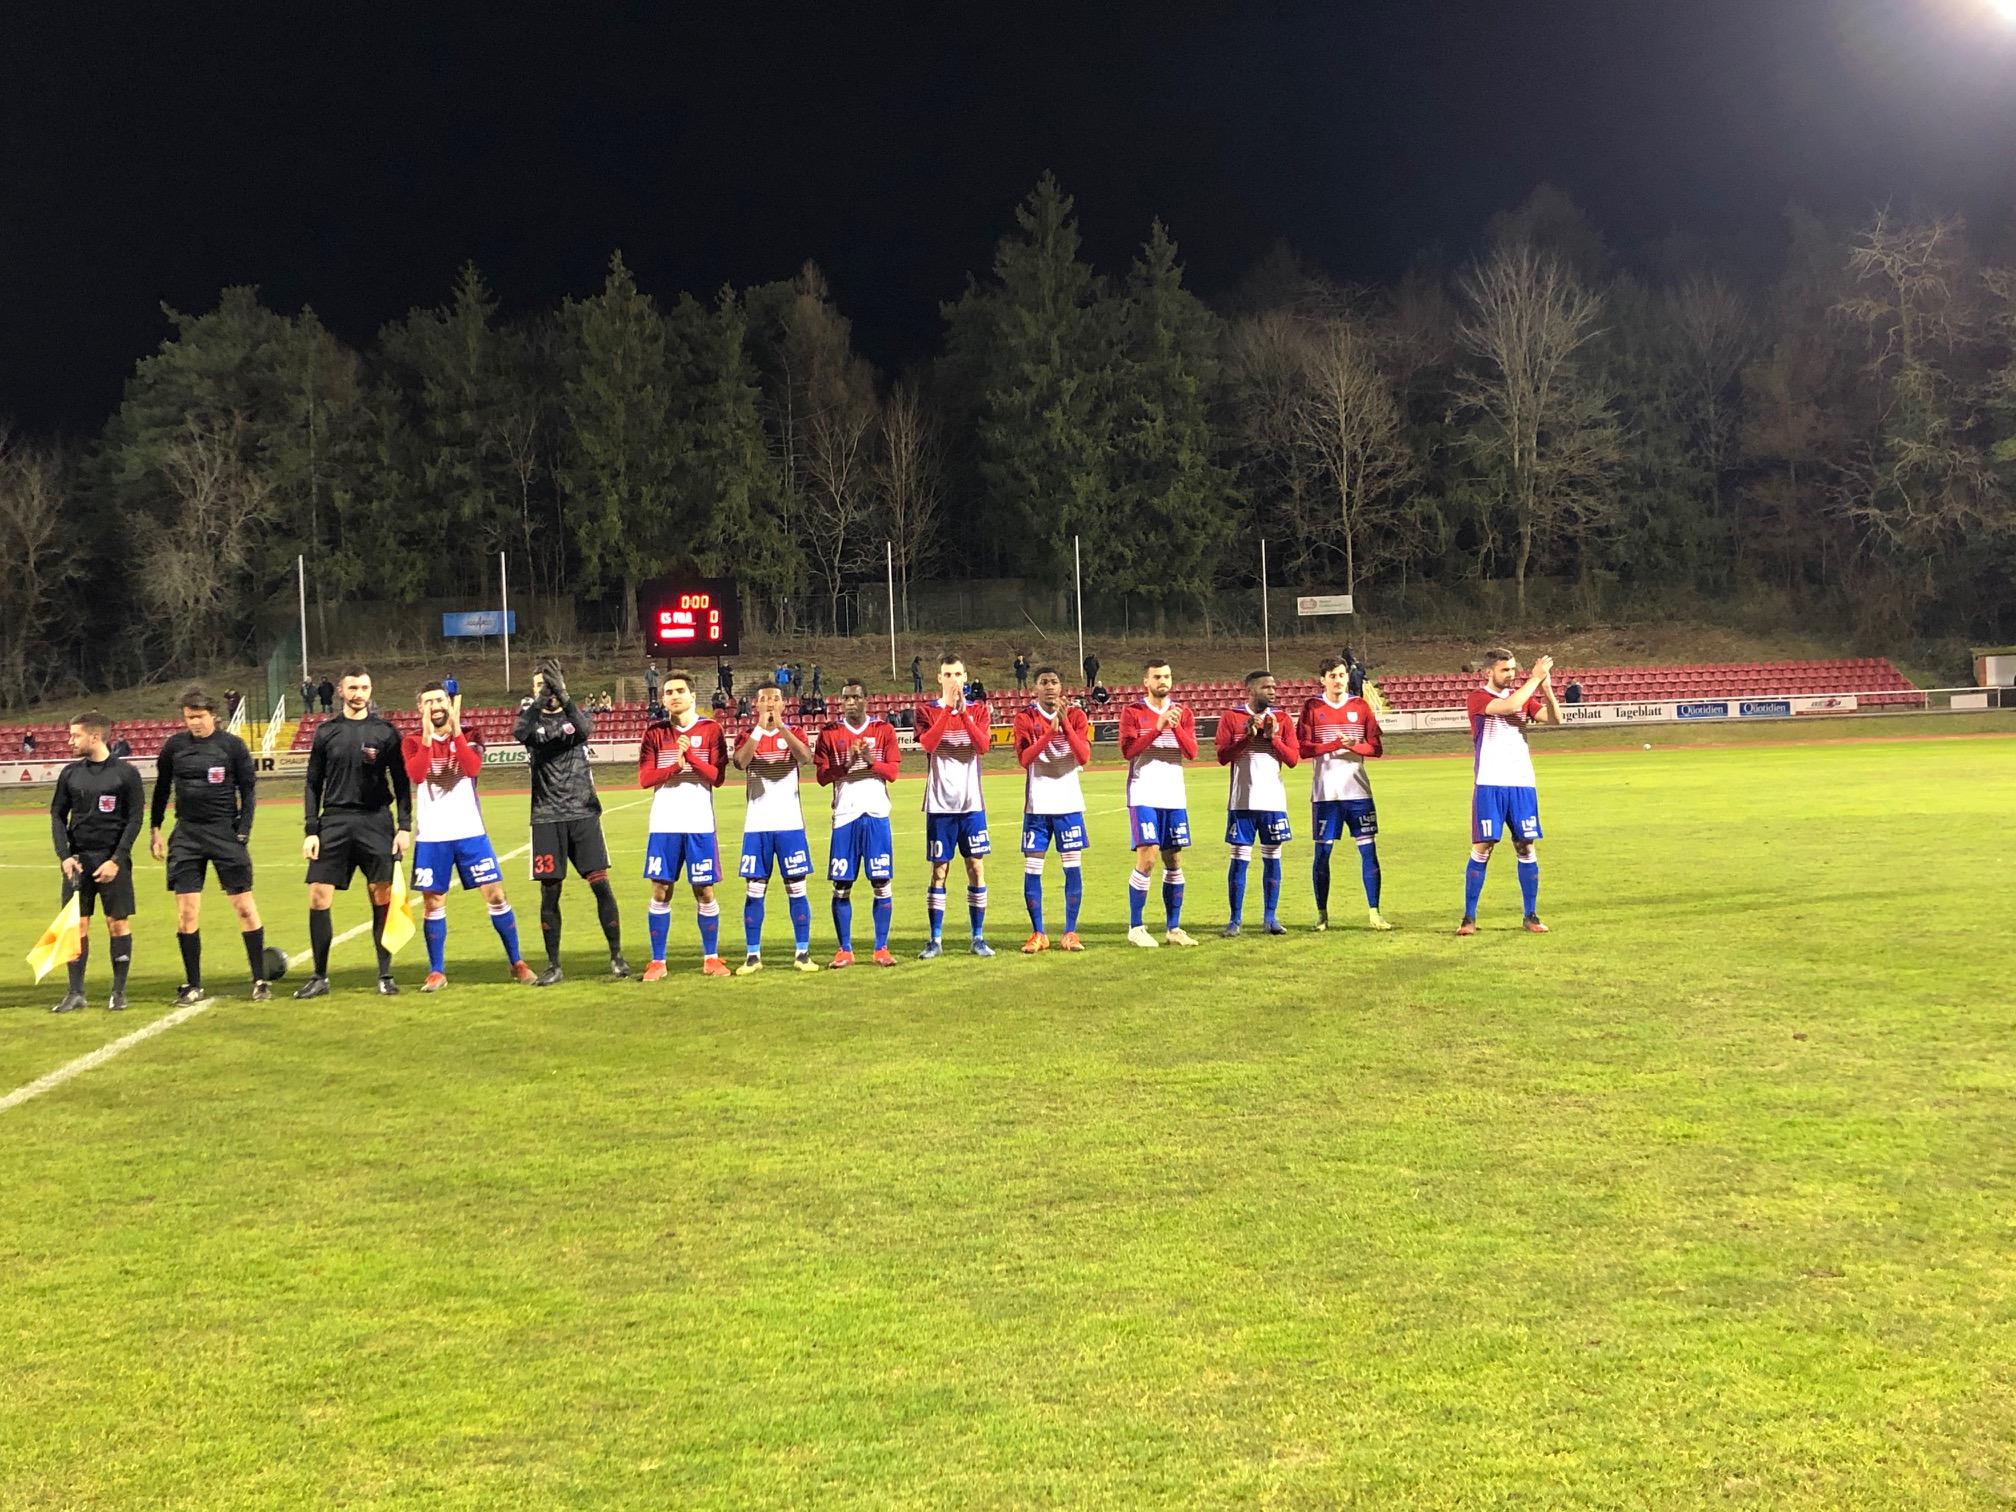 Belle victoire : CS FOLA - Muhlenbach 4-2